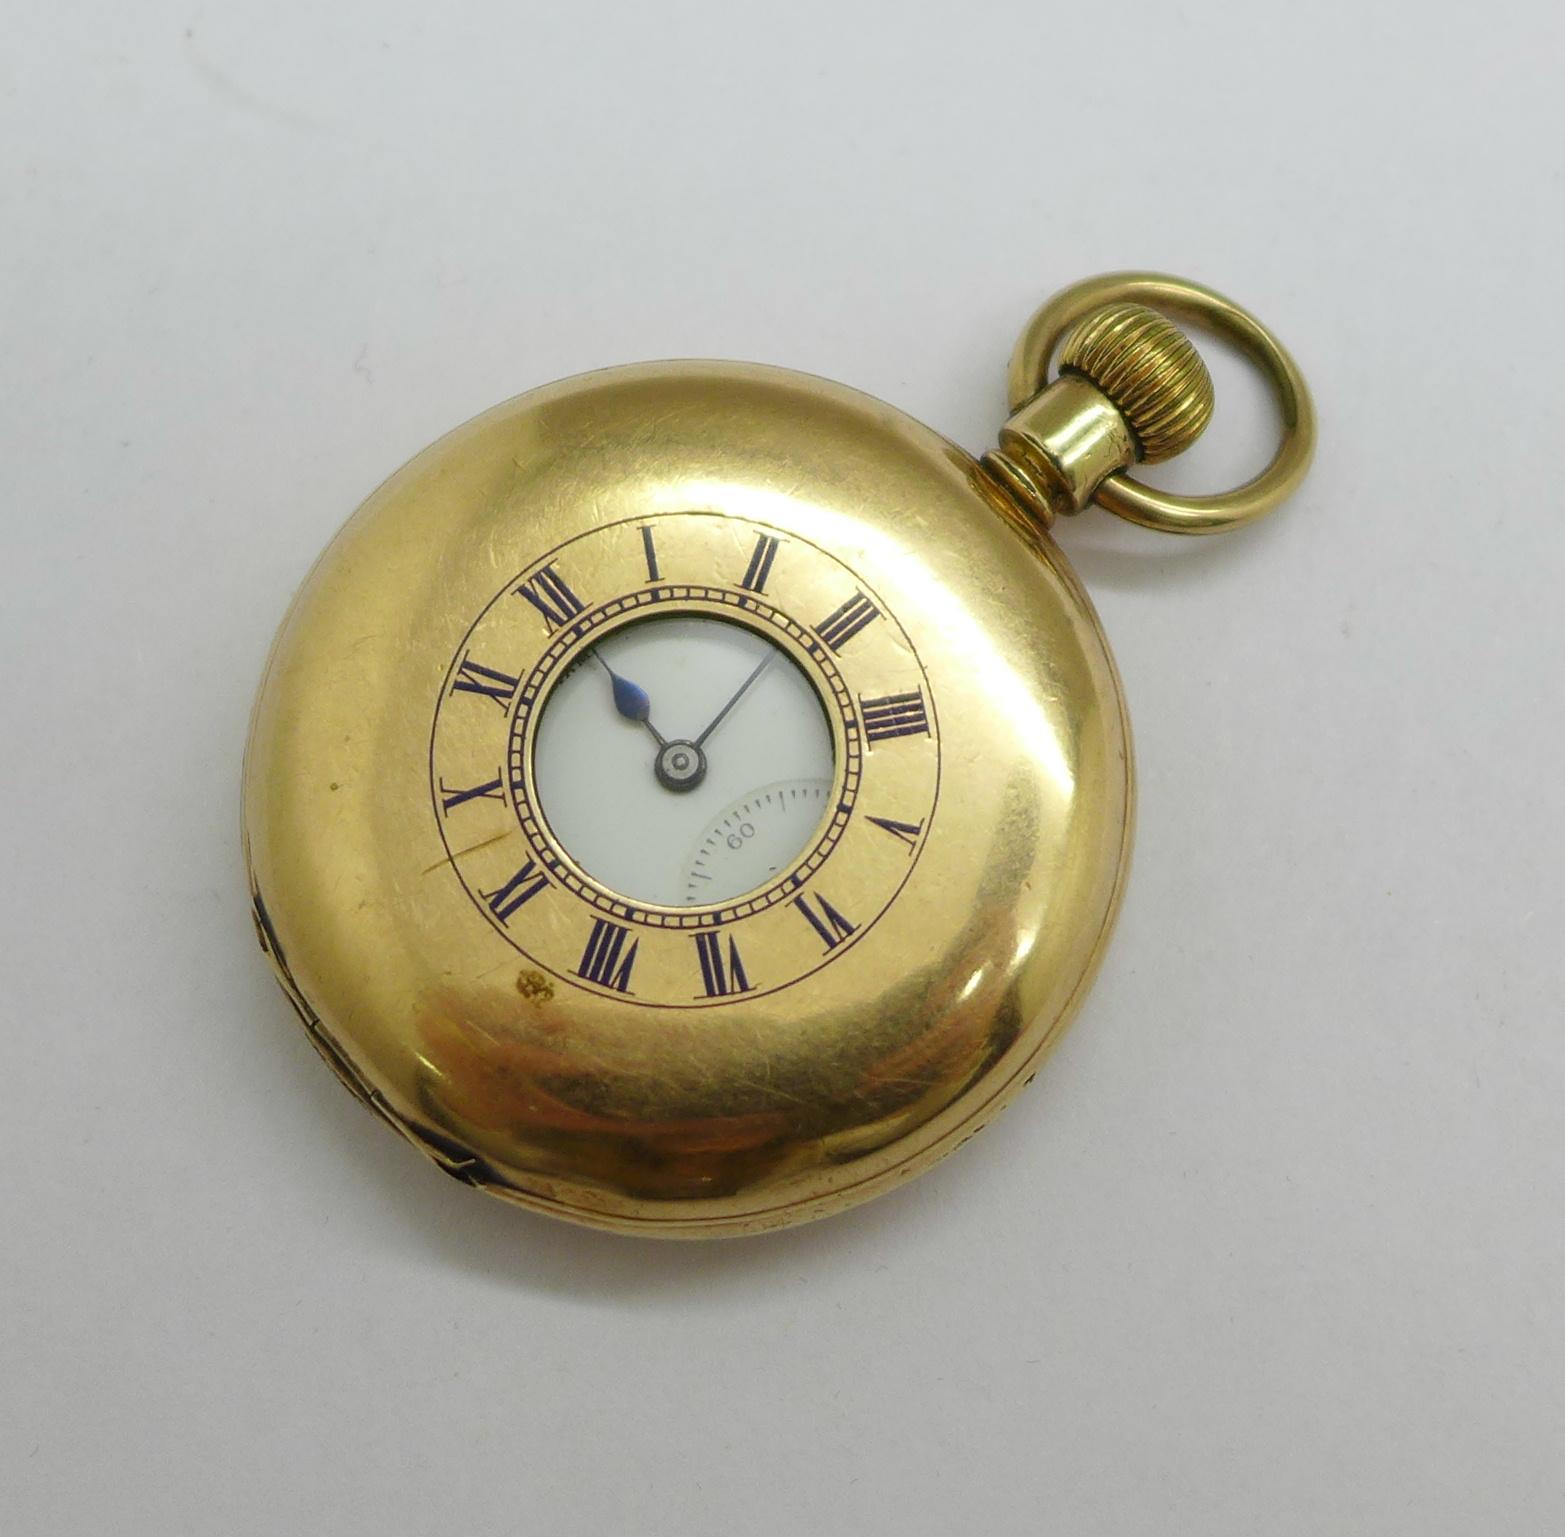 A Waltham gold plated half-hunter pocket watch, 4cm case